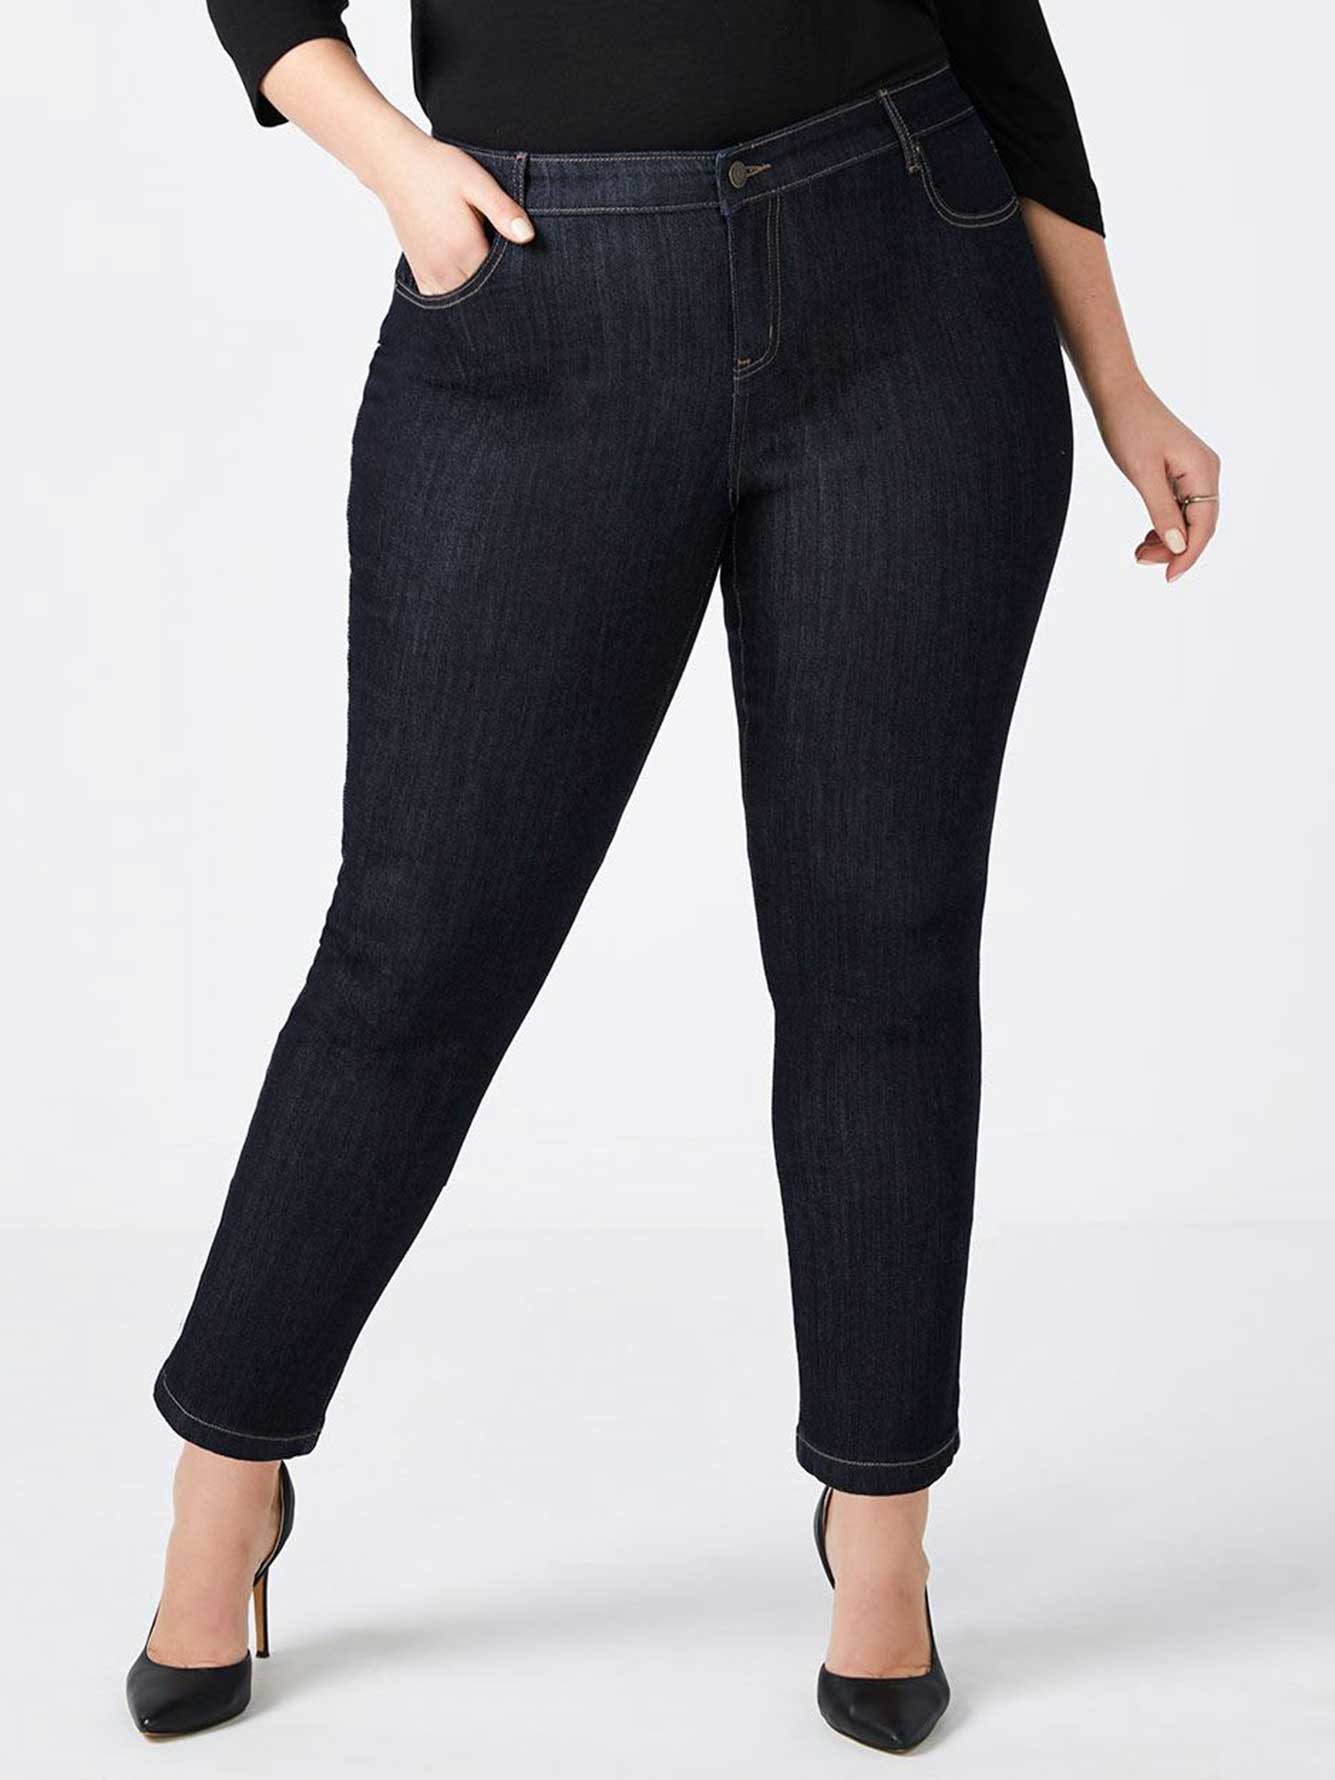 535c4e92755 Petite Slightly Curvy Fit Straight Leg Jean - d c JEANS